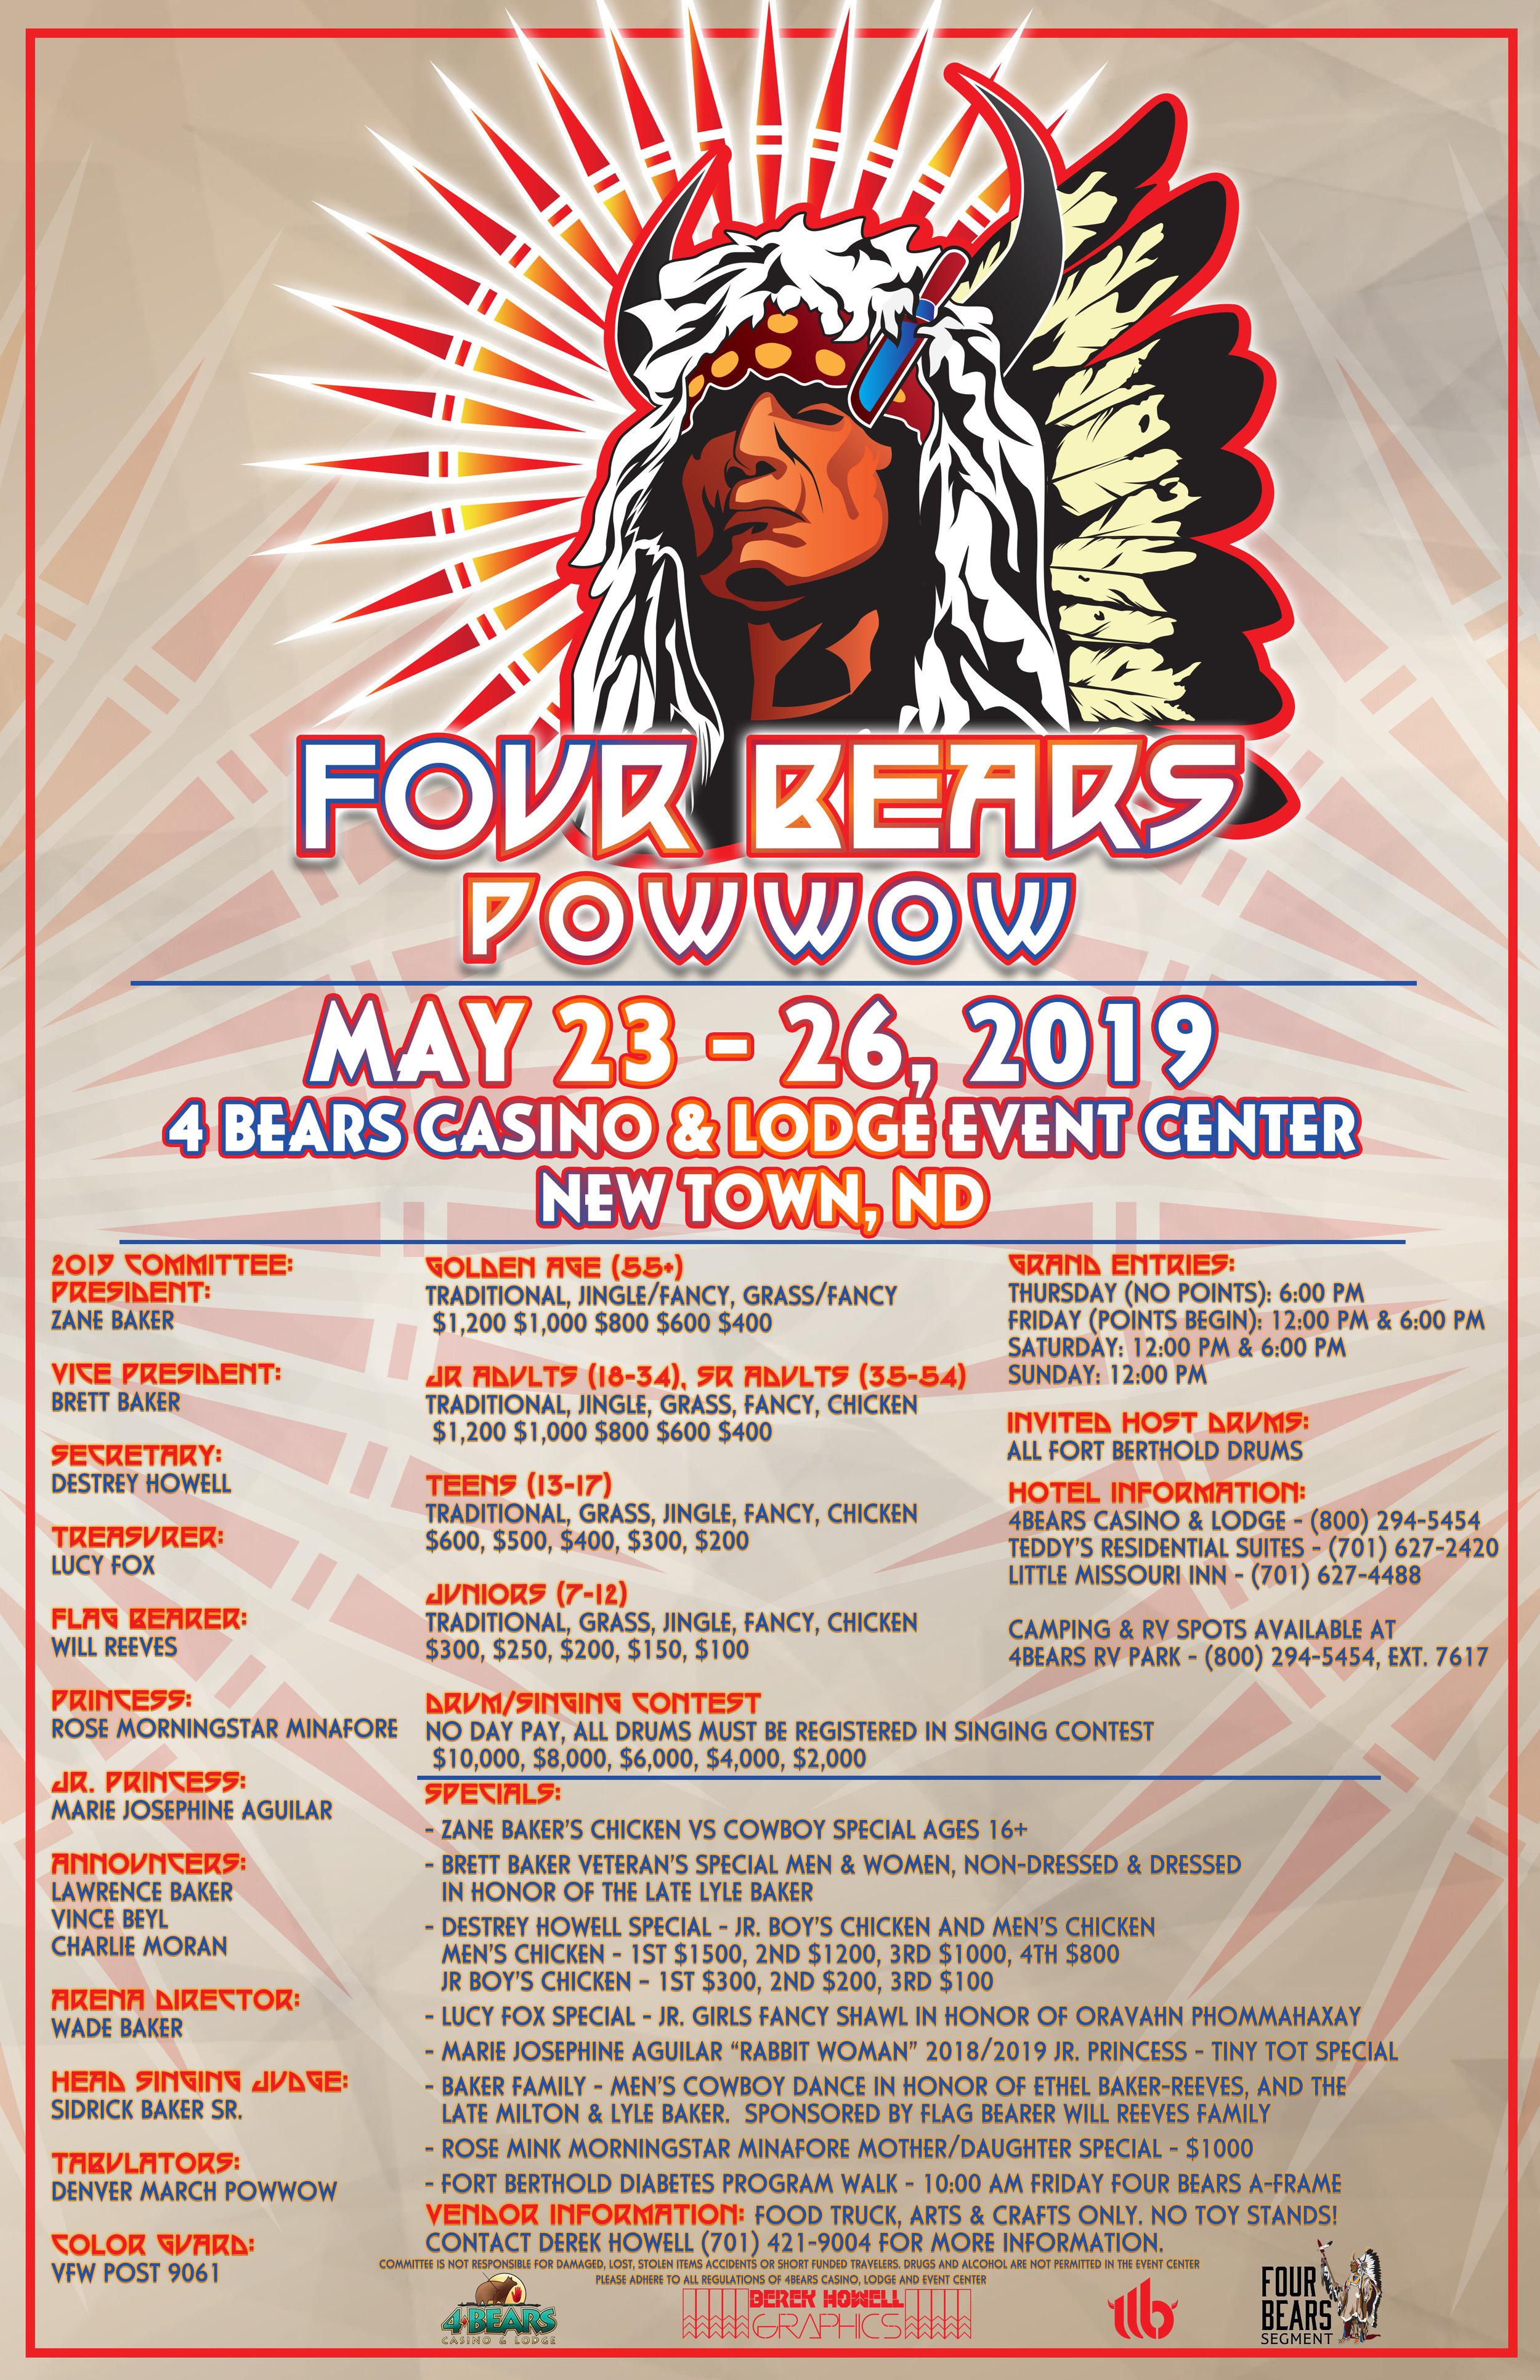 Four Bears Powwow Poster.jpg